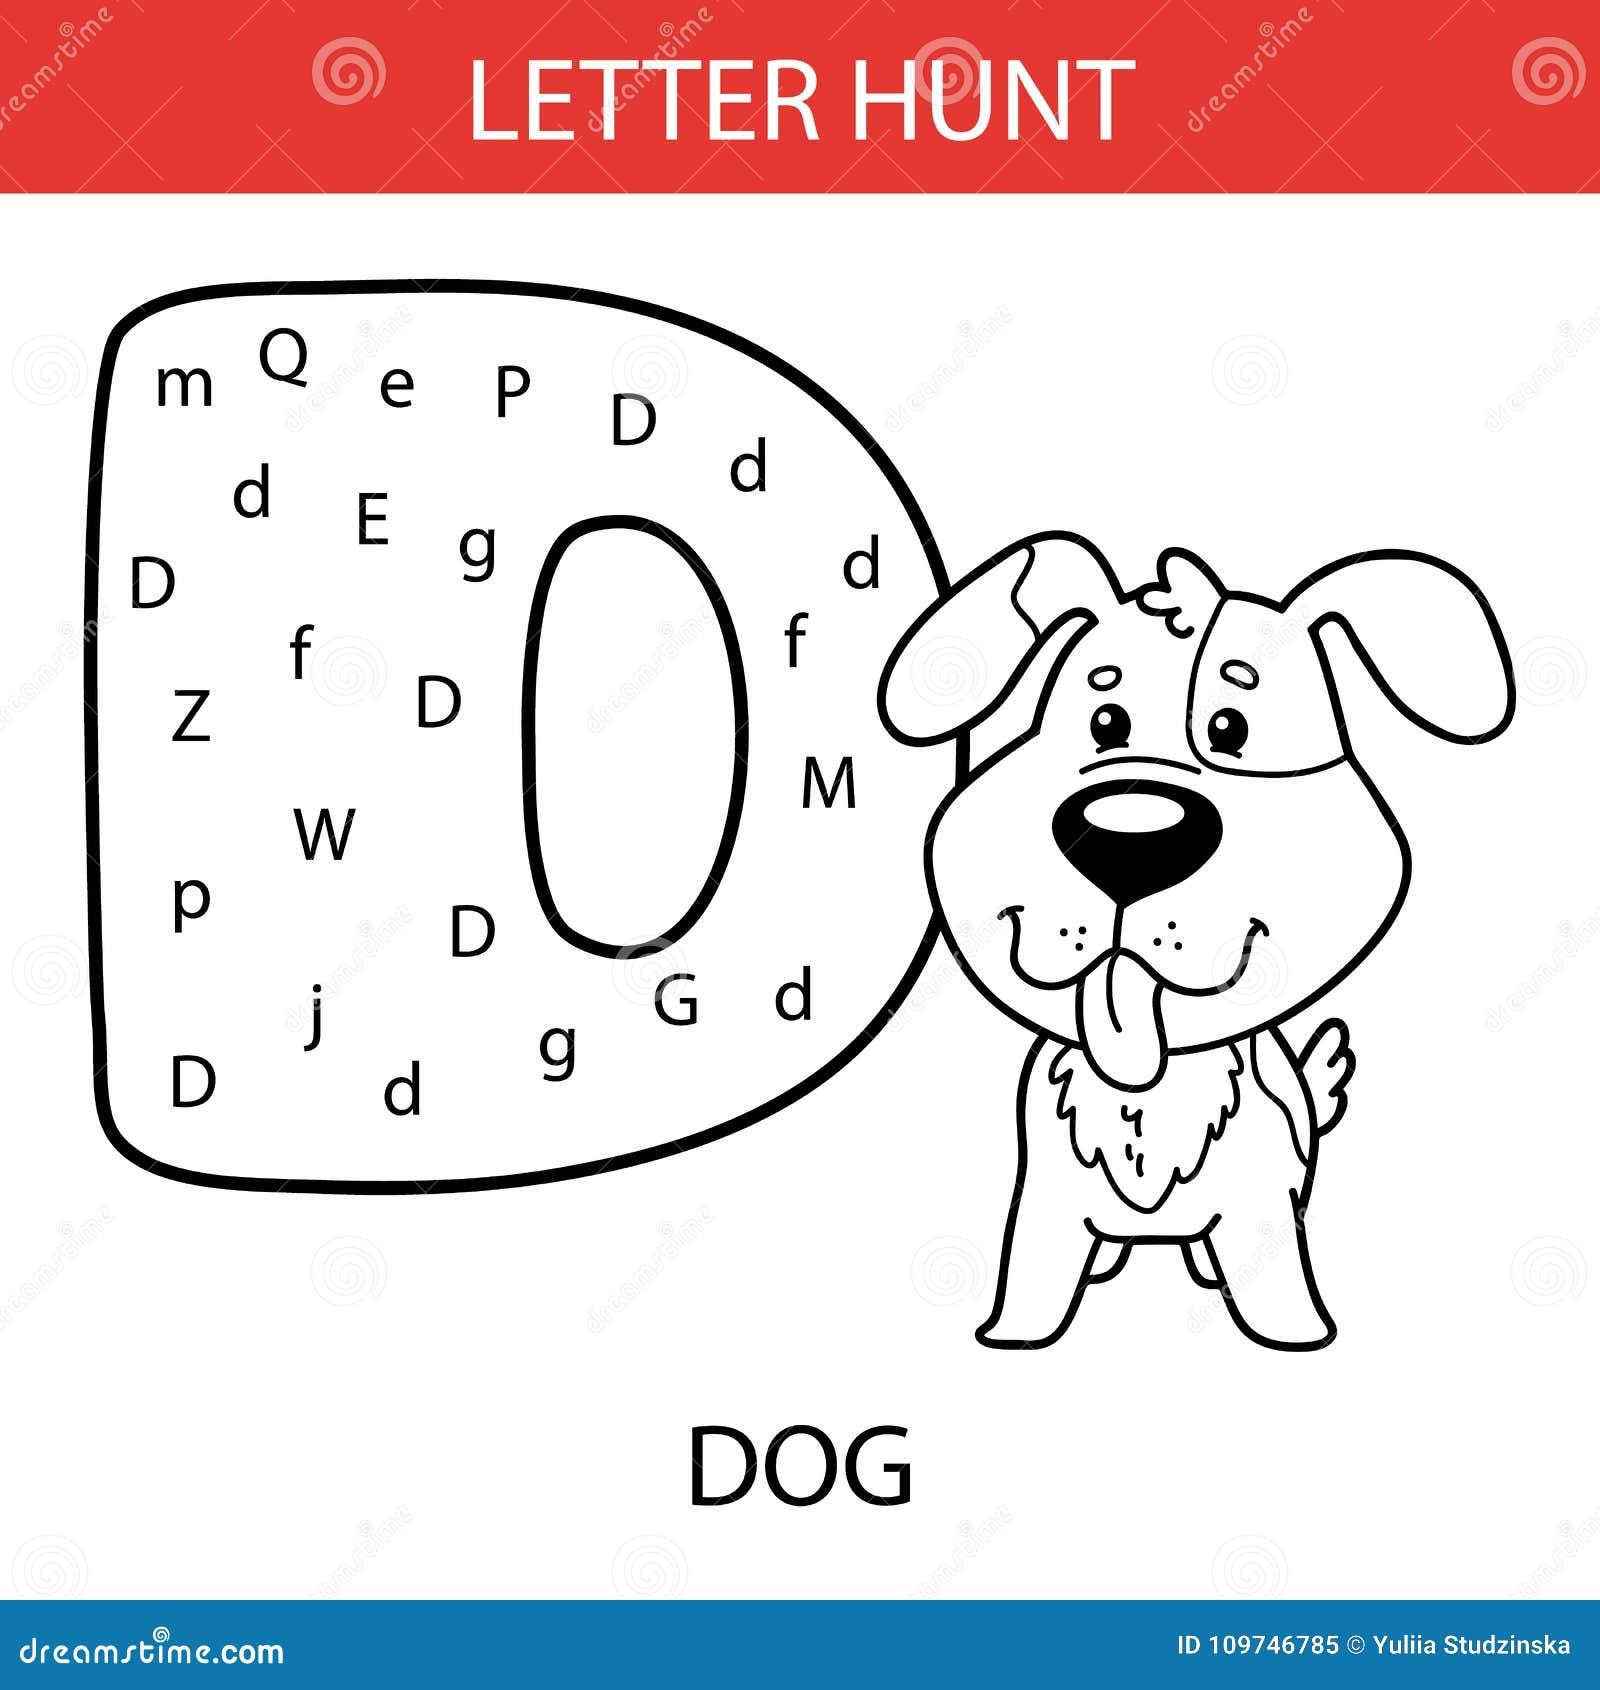 Animal Letter Hunt Puppy Stock Vector Illustration Of English